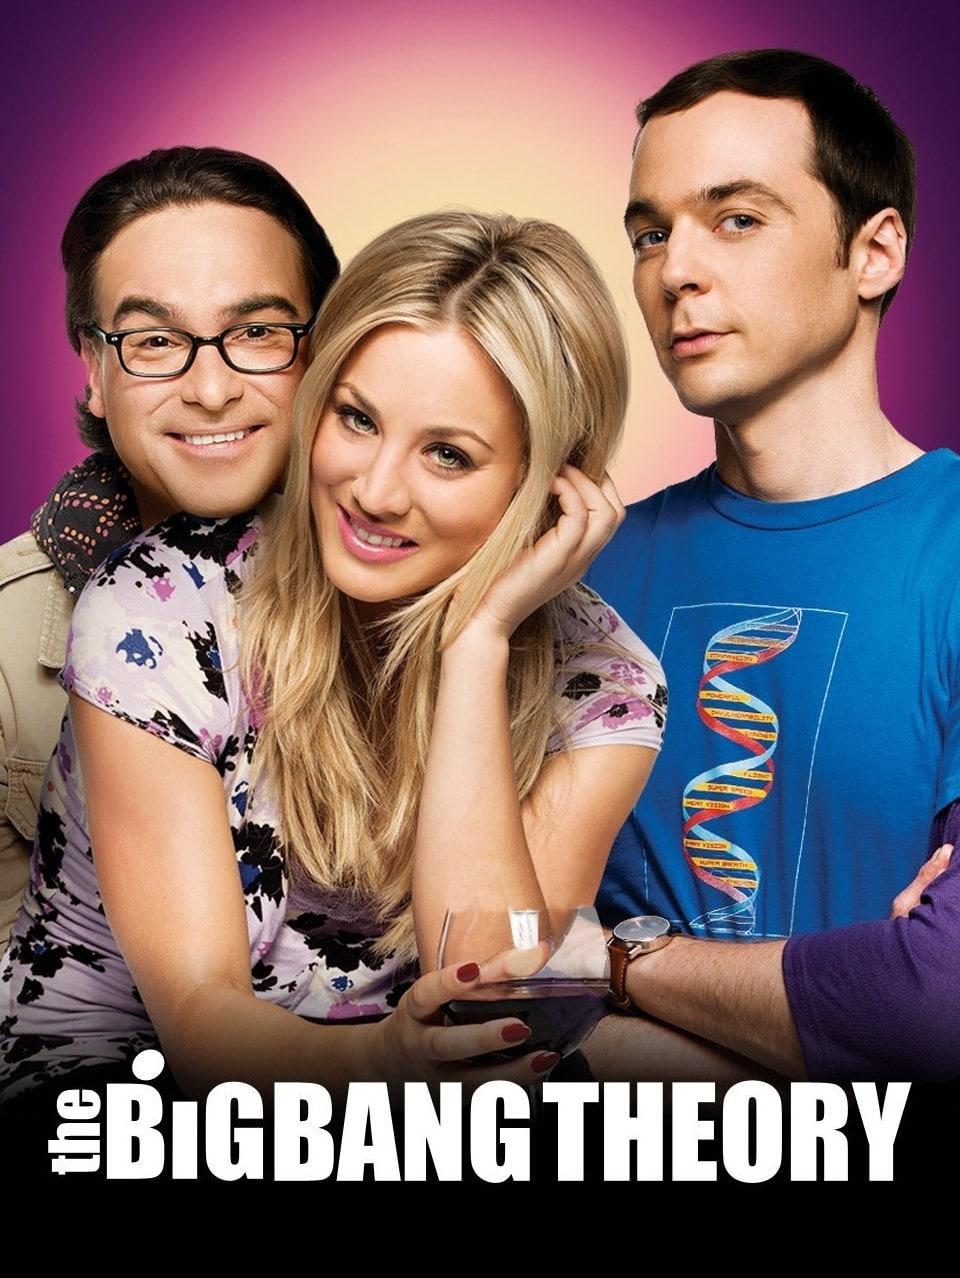 the-big-bang-theory-on-hulu